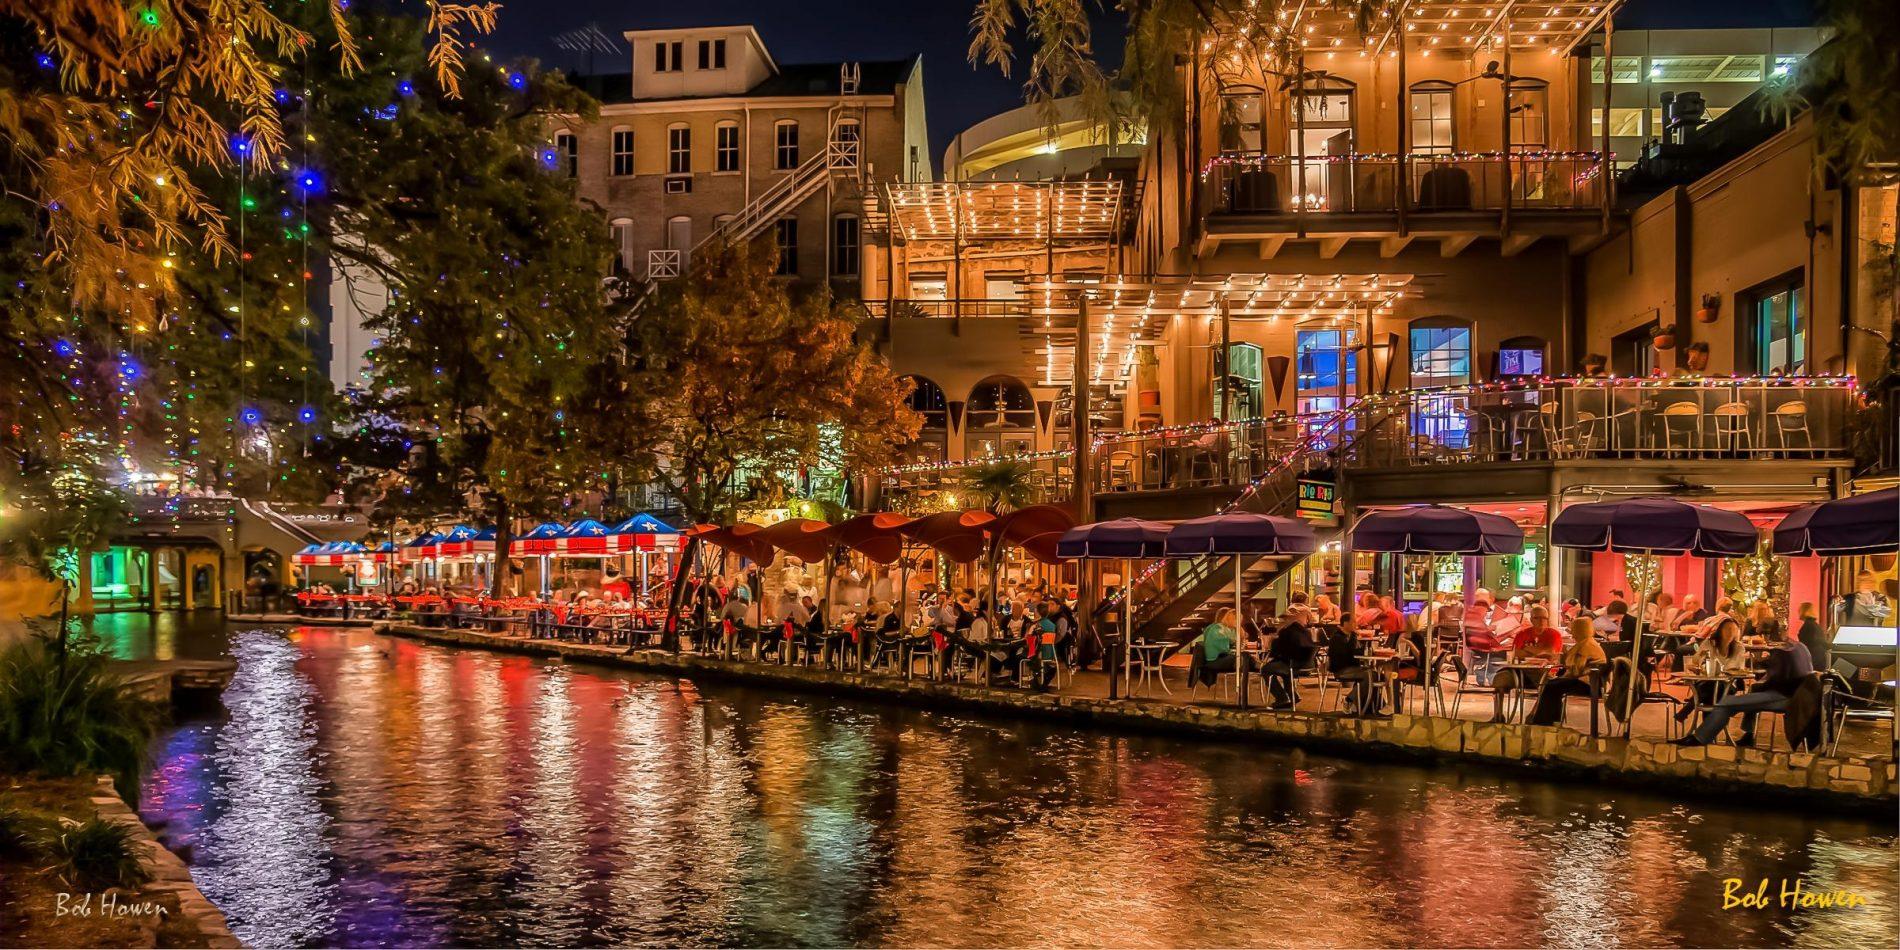 Vista noturna da charmosa cena gastronômica de San Antonio, no Texas